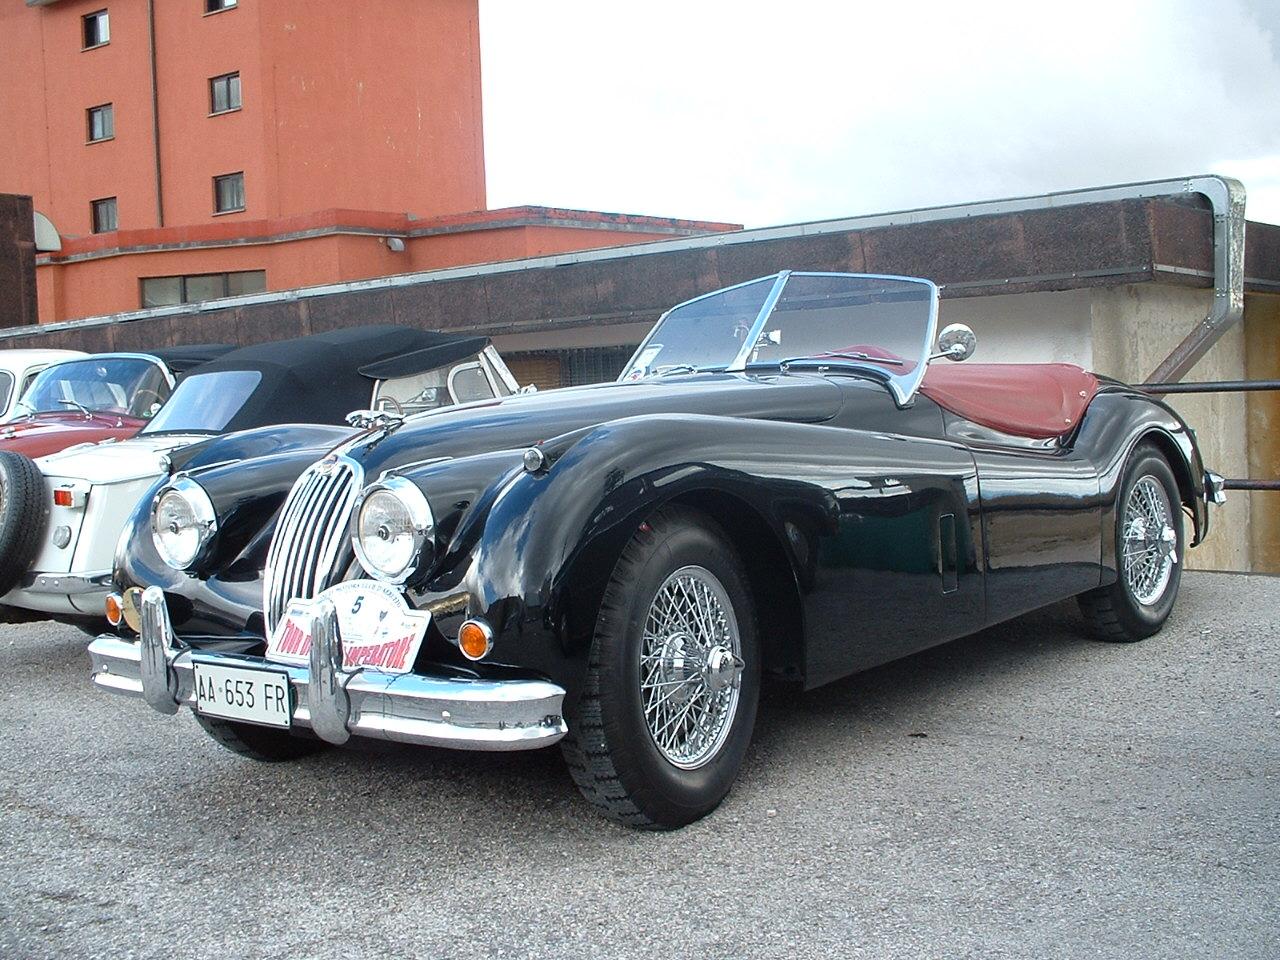 http://upload.wikimedia.org/wikipedia/commons/0/0a/Jaguar_XK_140%2C_1954.JPG